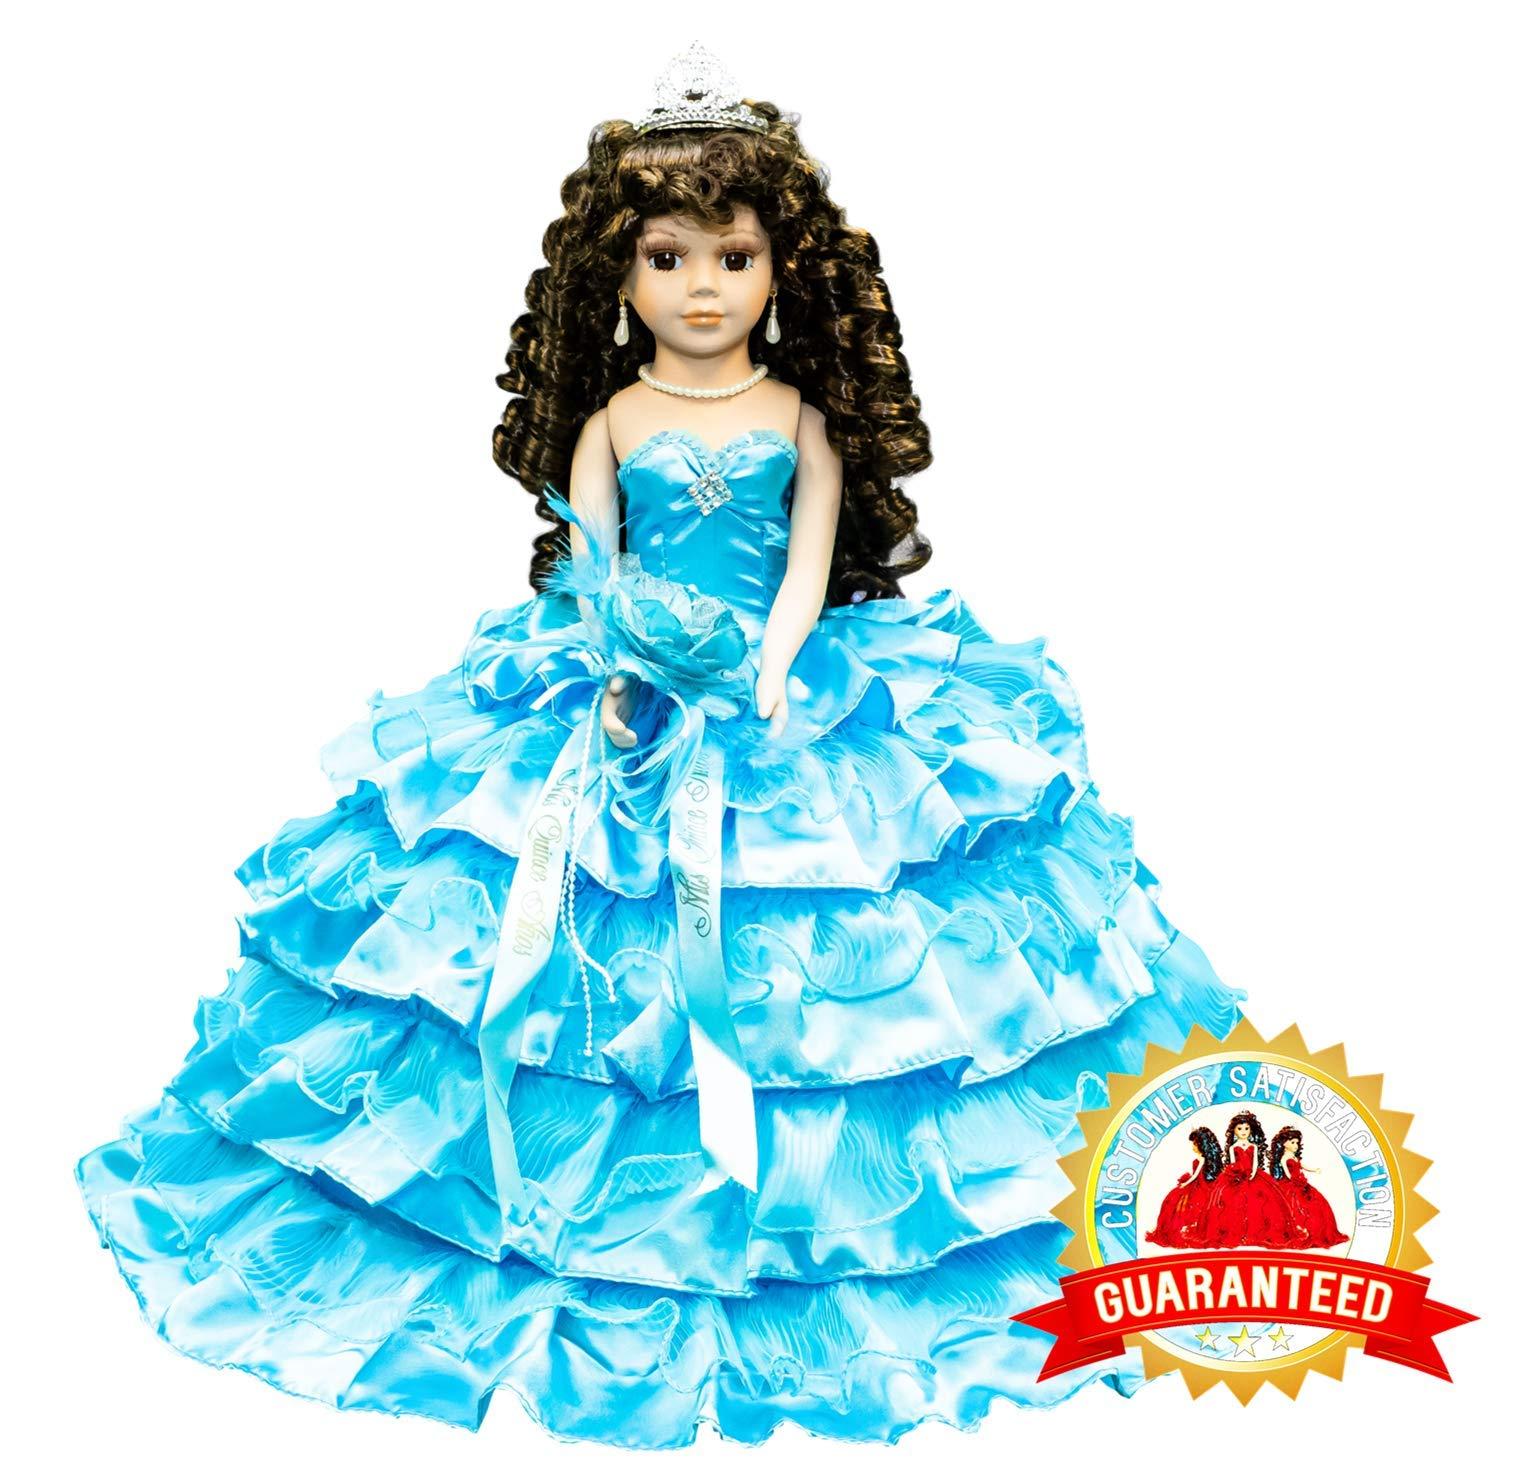 Kinnex Collections by Amanda 18'' Porcelain Quinceanera Umbrella Doll (Table Centerpiece) ~ Turquoise ~ KK18729-10